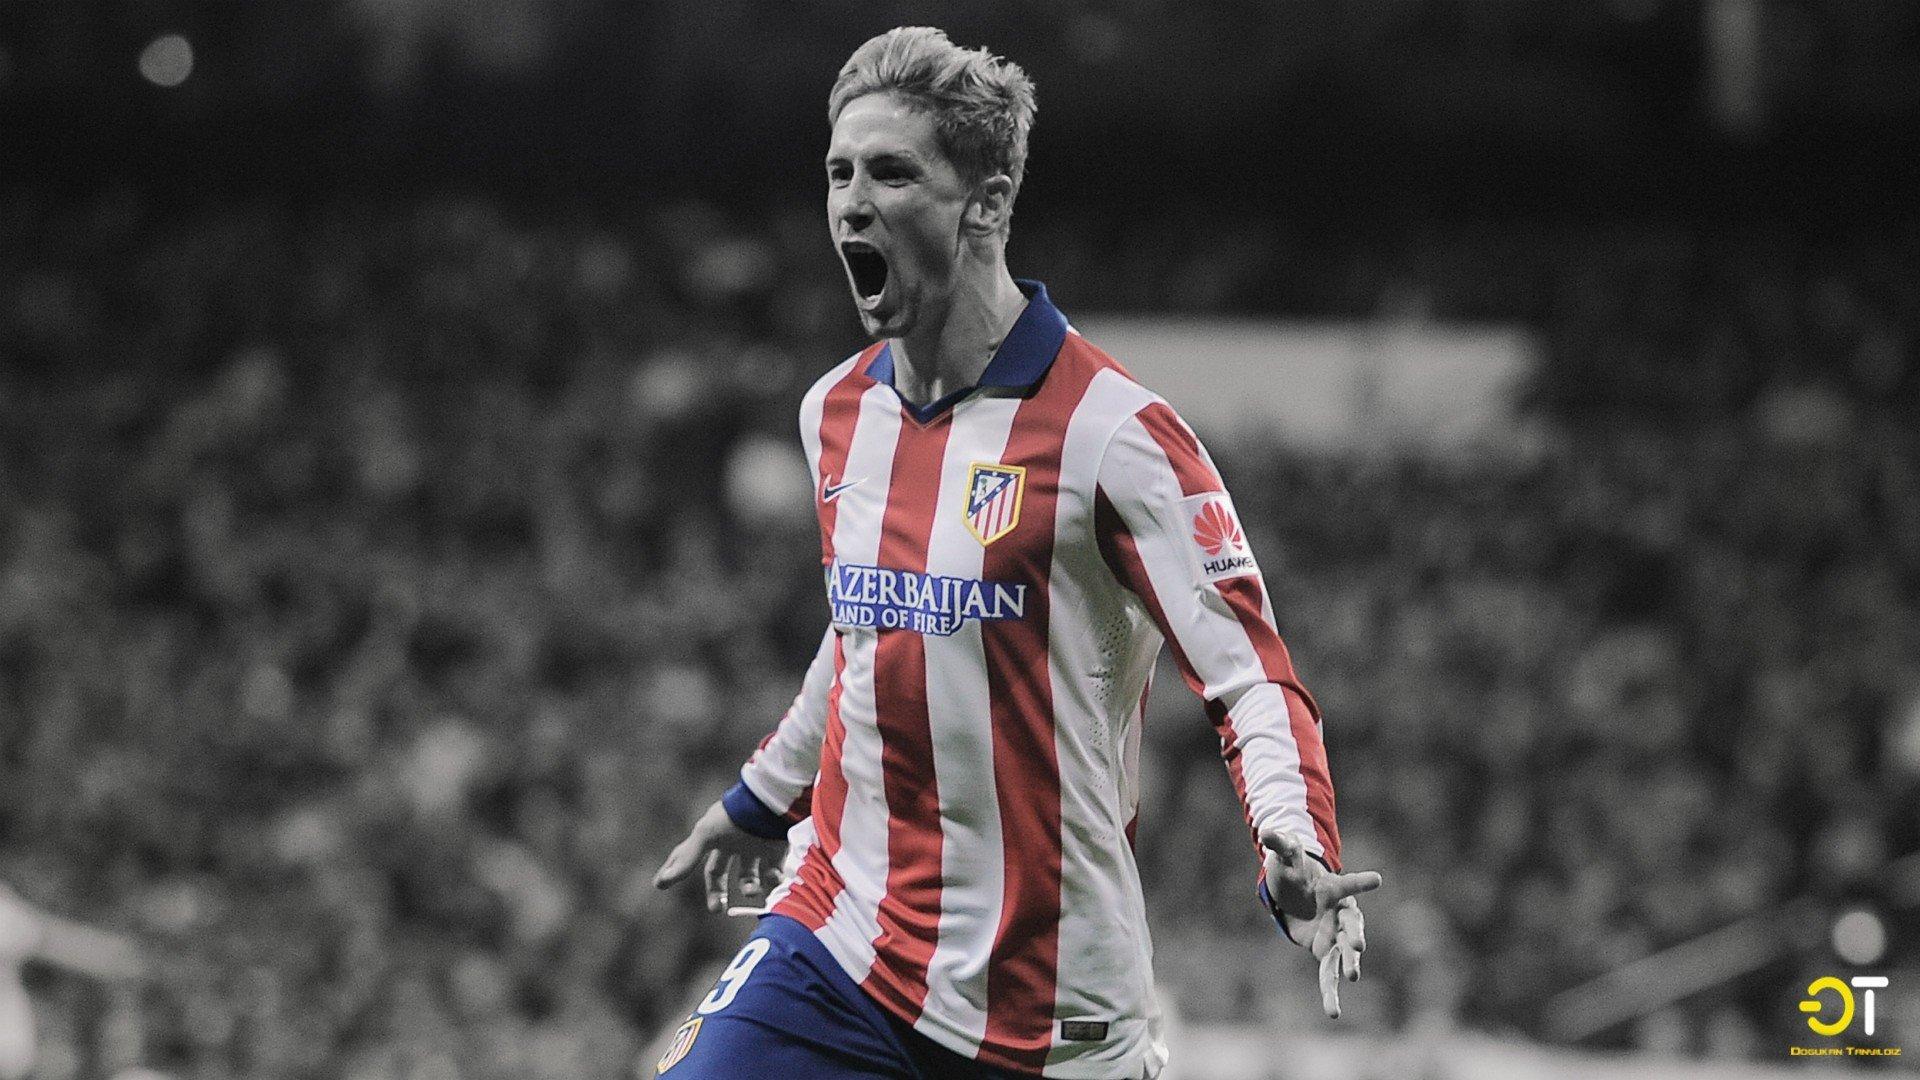 Fernando Torres, Atletico Madrid, Azerbaijan, Men Wallpaper